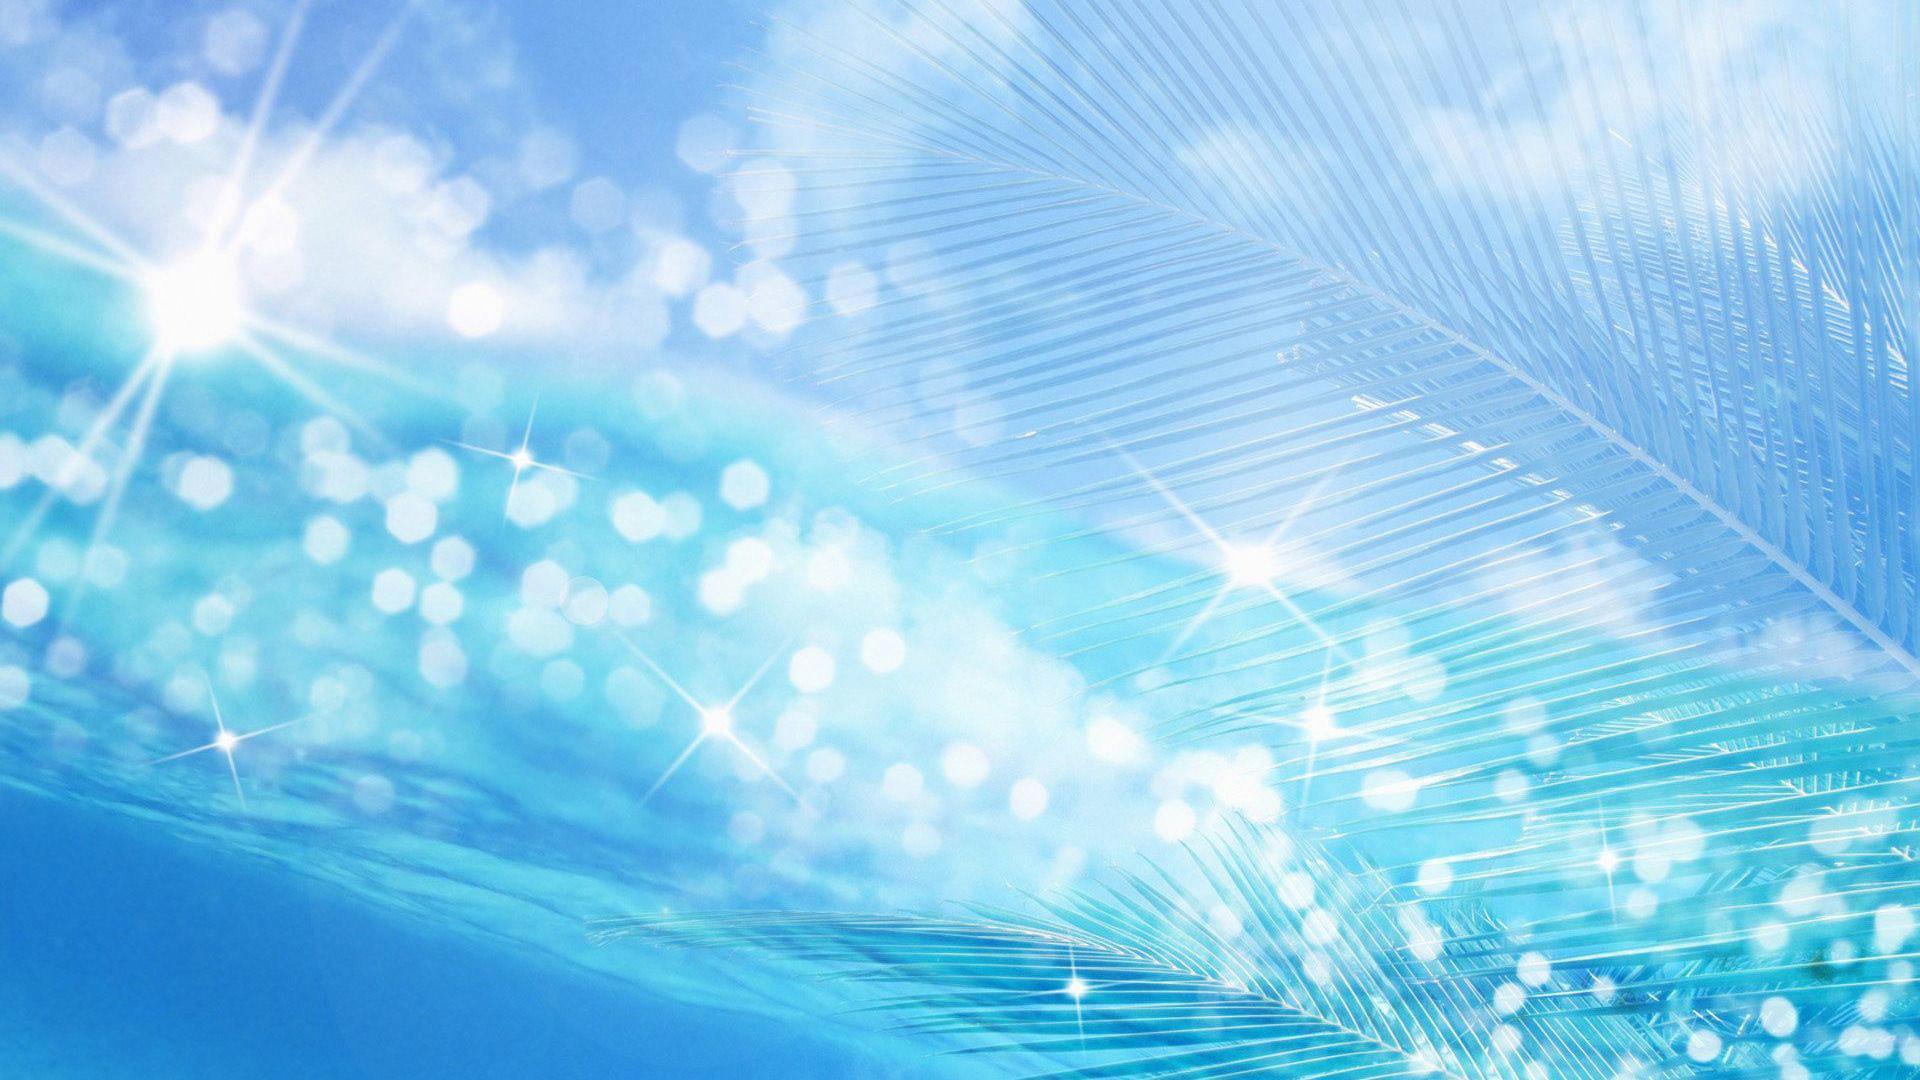 15+ Best New 1080p High Resolution Light Blue Background Hd